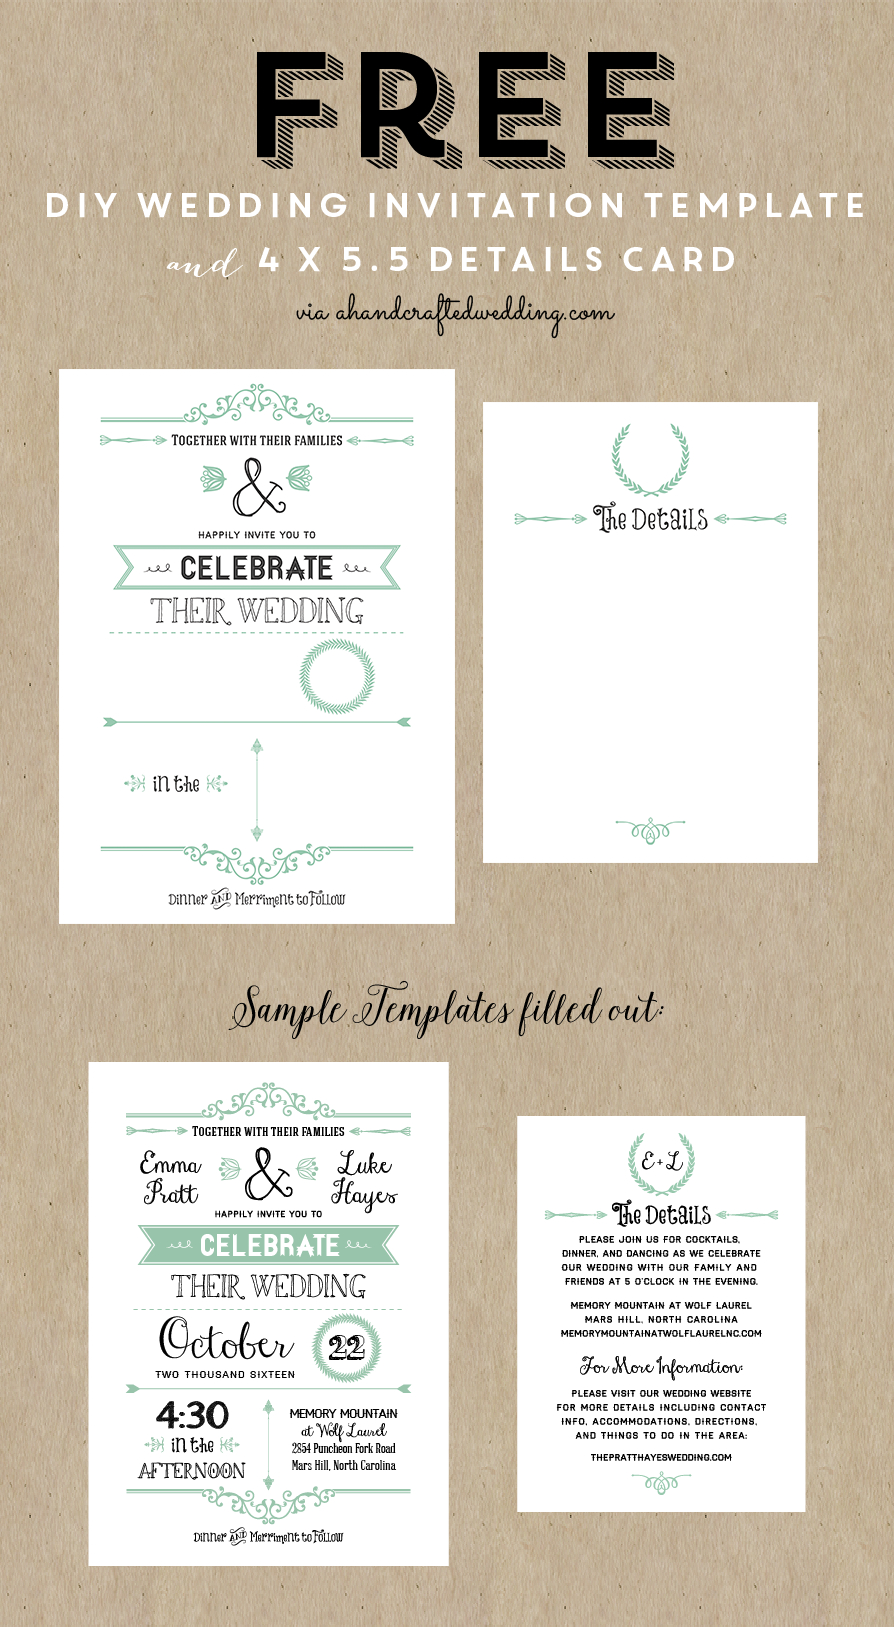 Free Printable Wedding Invitation Template | Wedding | Free Wedding - Free Printable Wedding Invitations